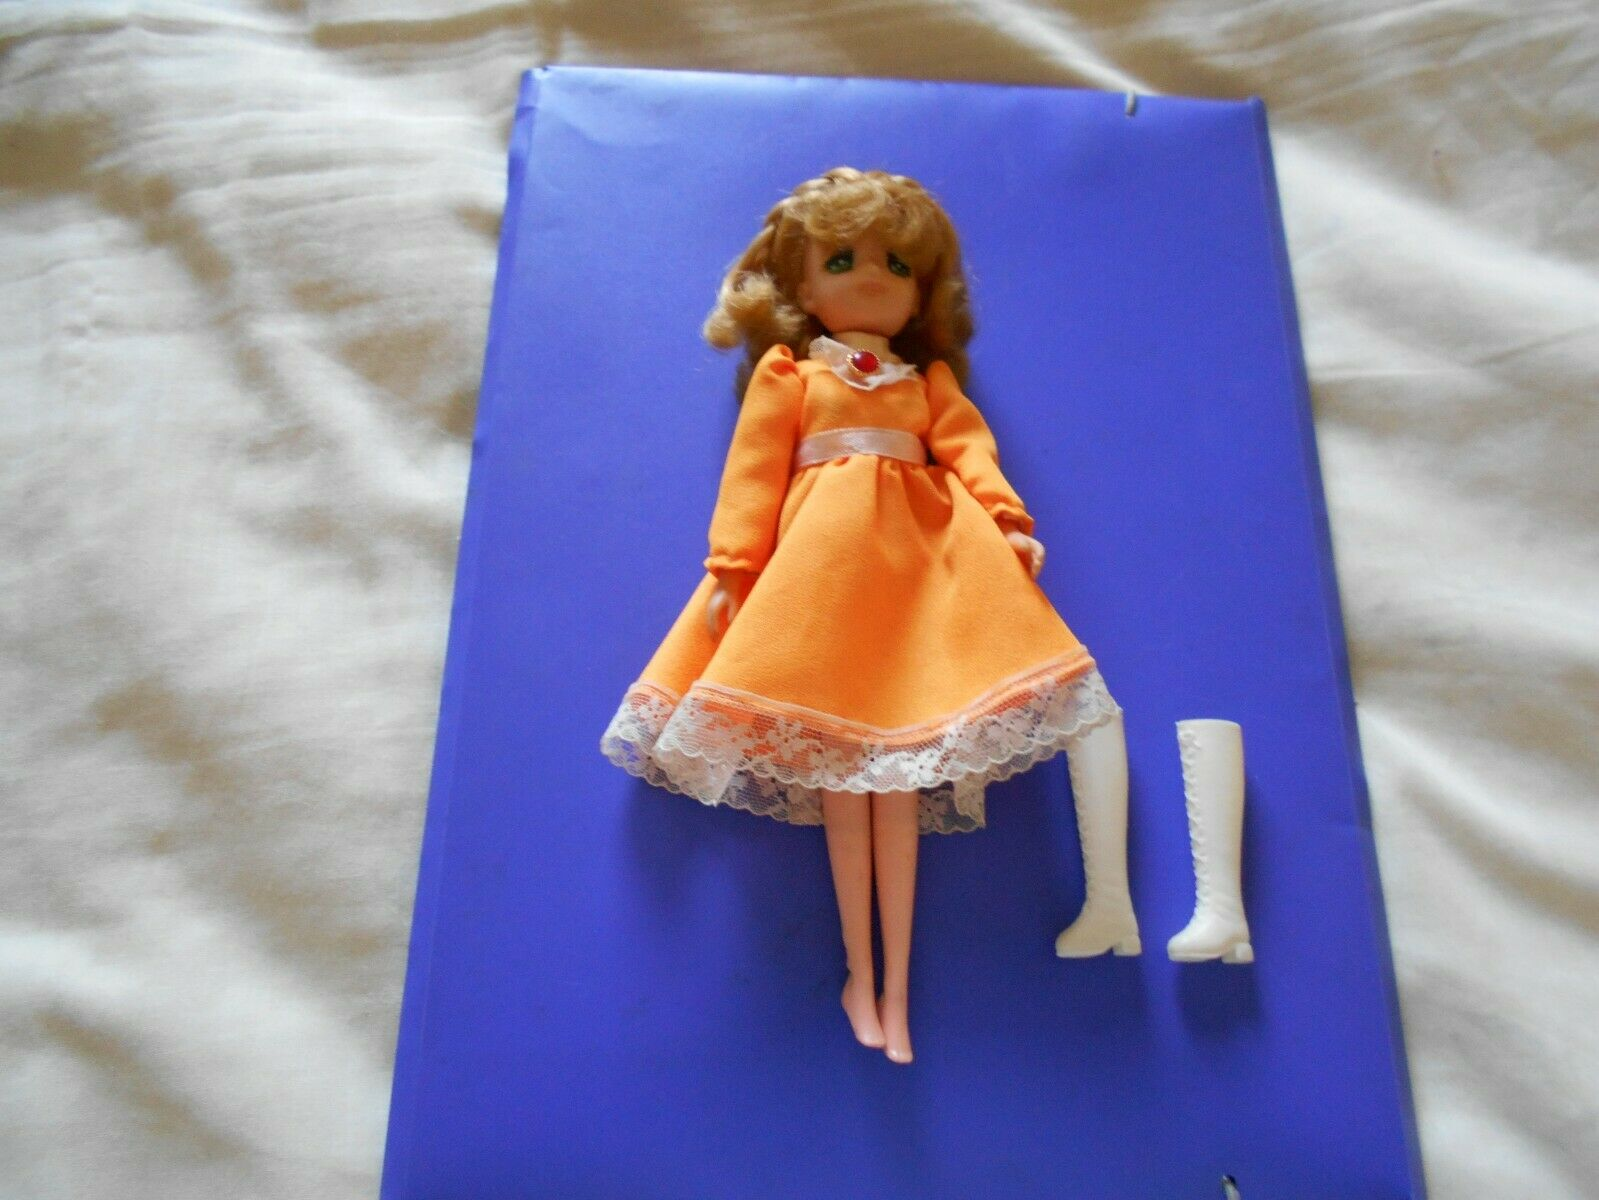 Candy Candy doll bambola vintage Popy rarissima NO box con omaggio leggere bene